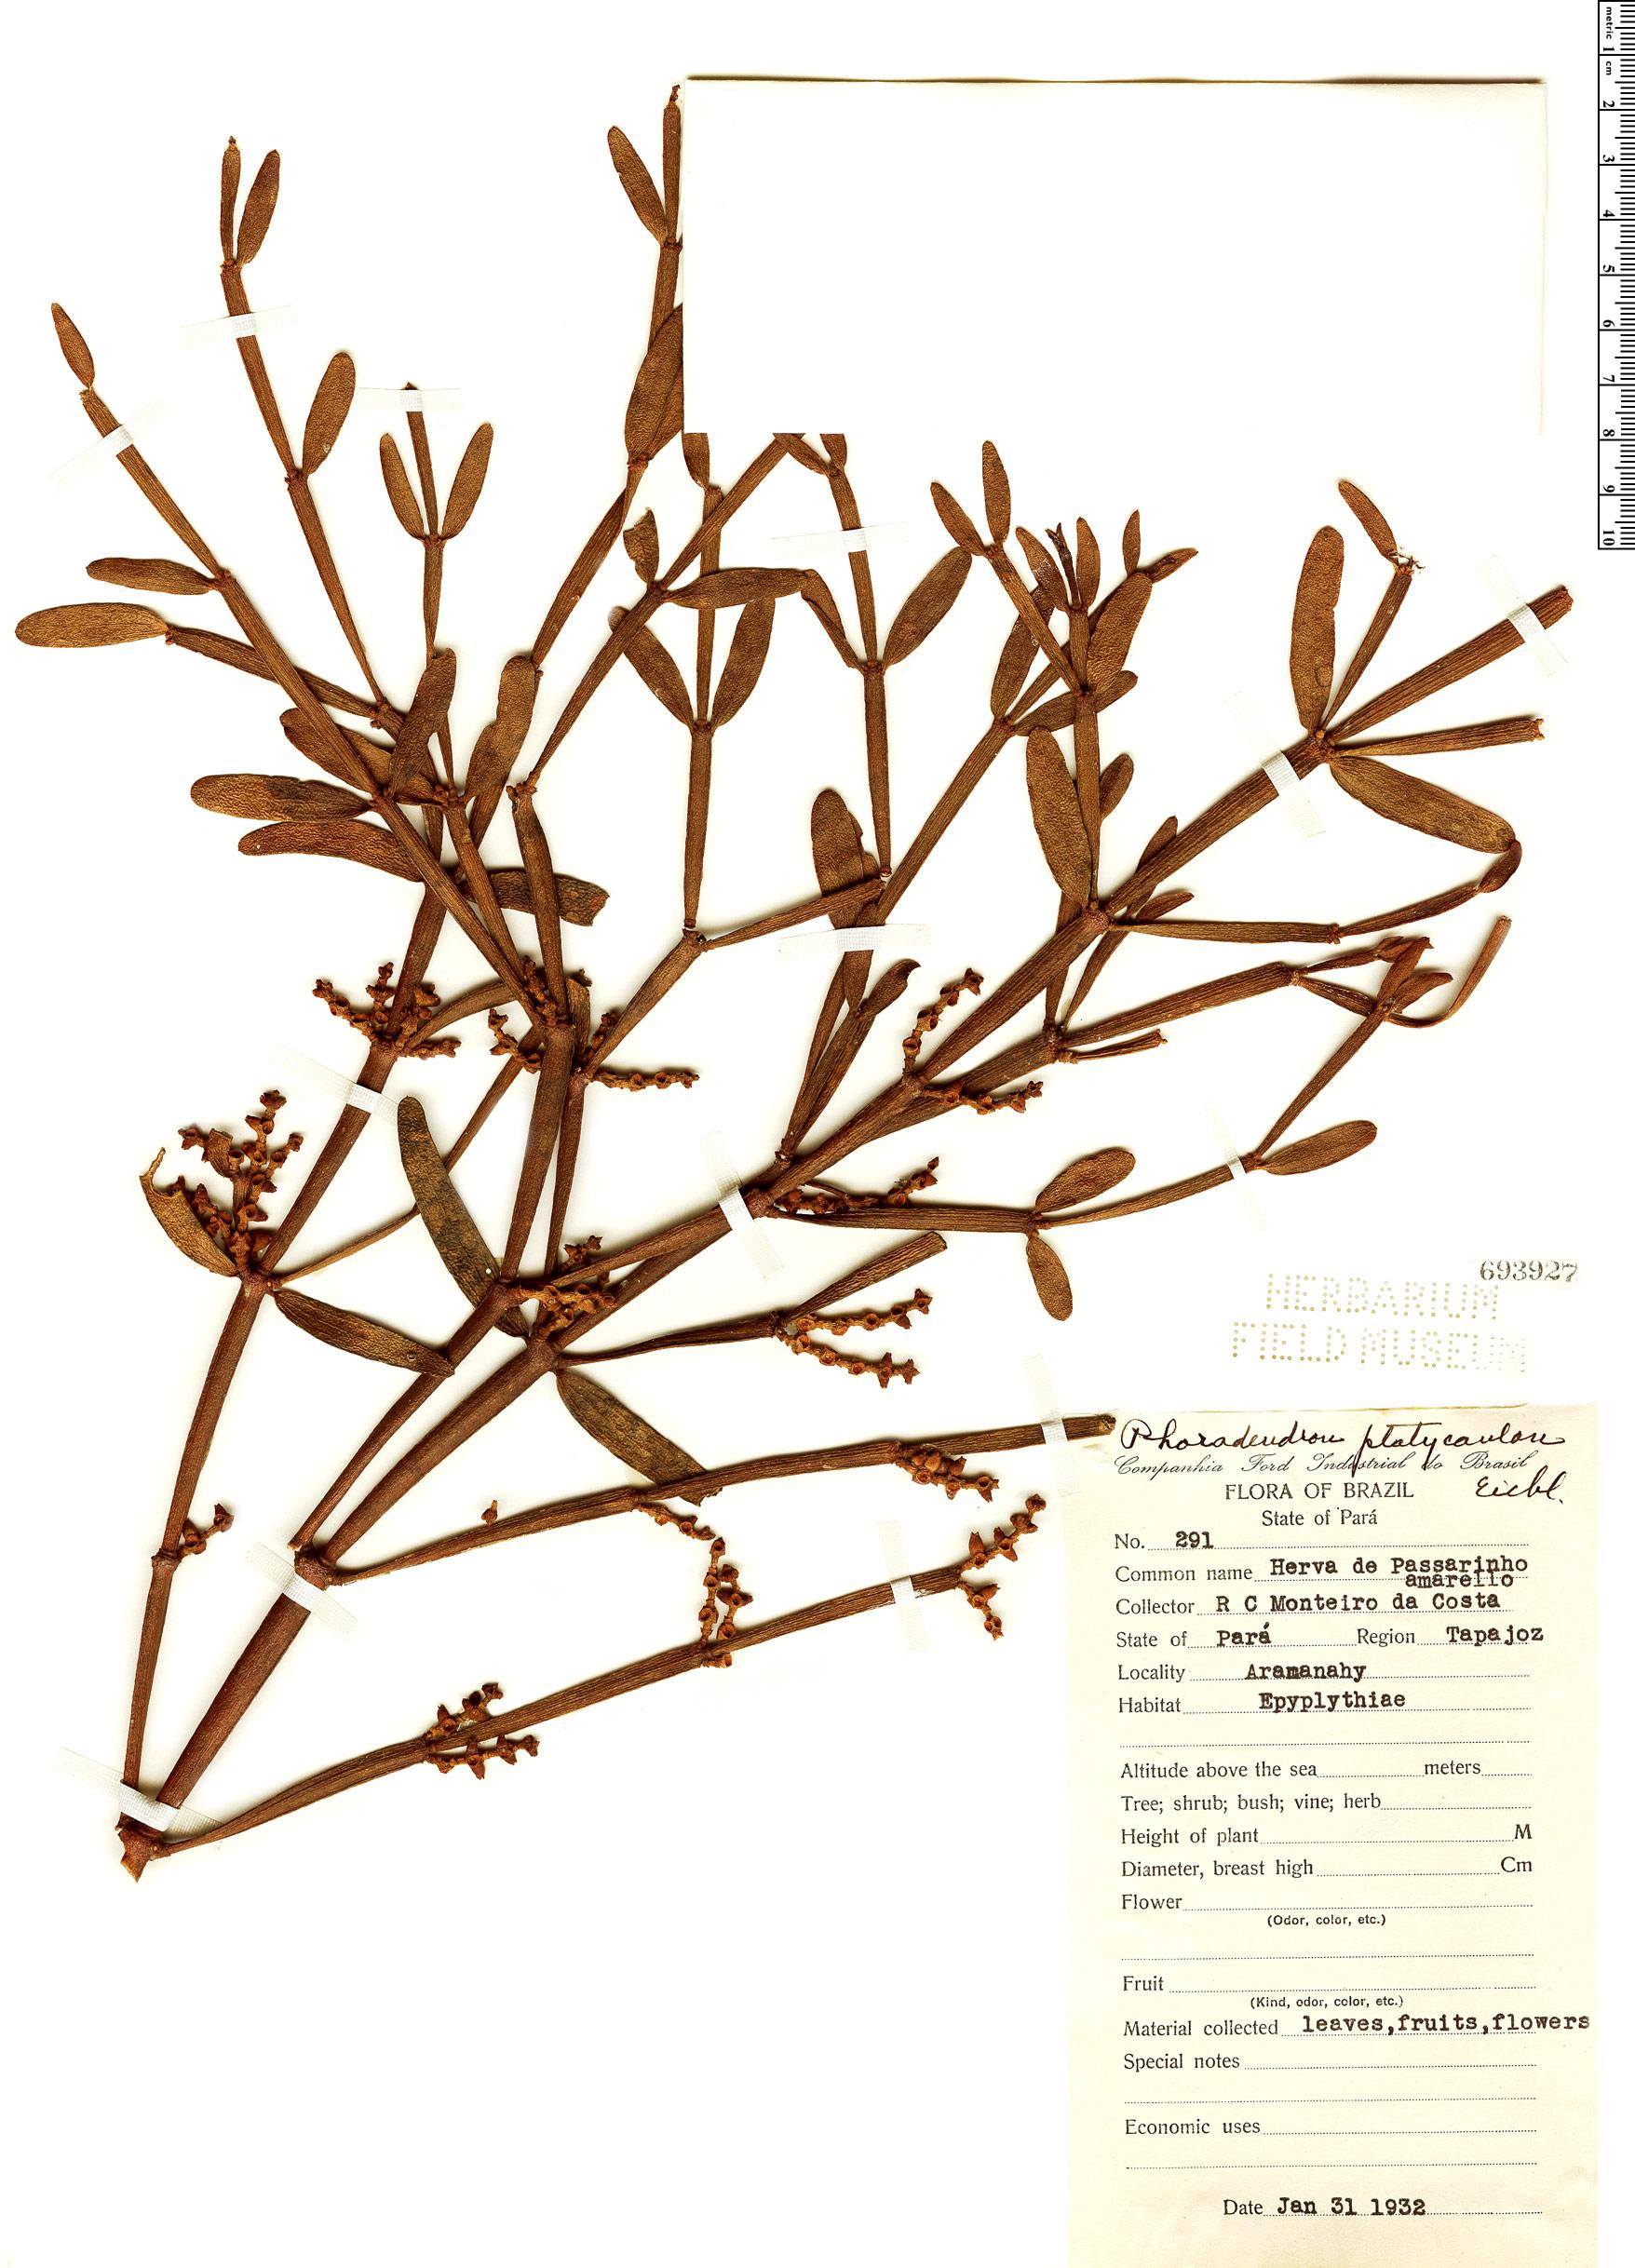 Specimen: Phoradendron platycaulon